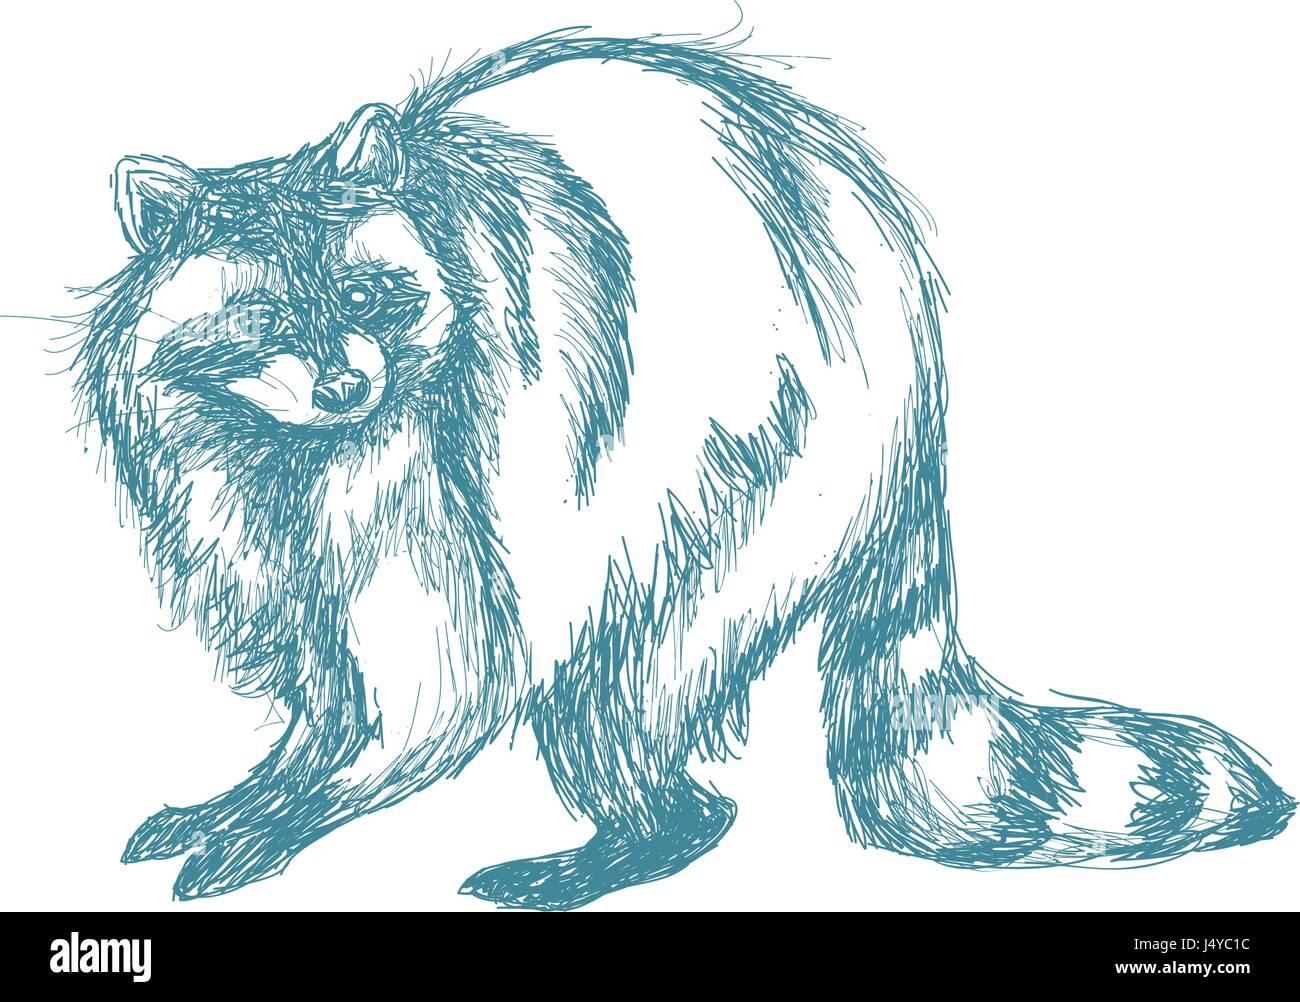 illustration engraving sketch stock photos u0026 illustration